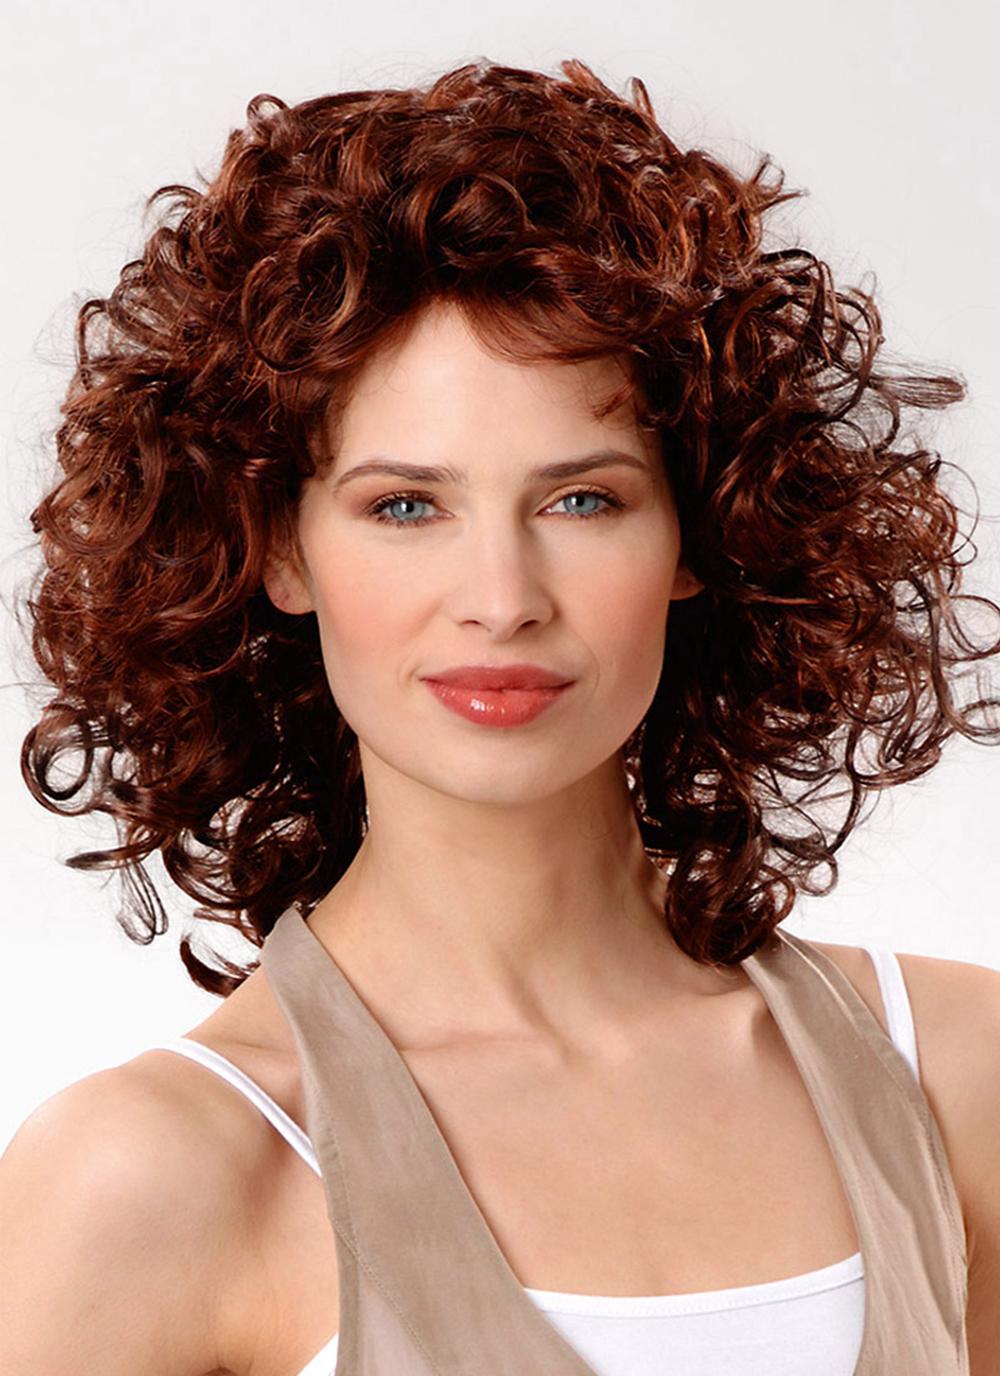 Dening Hair Perücke: Tania New gross